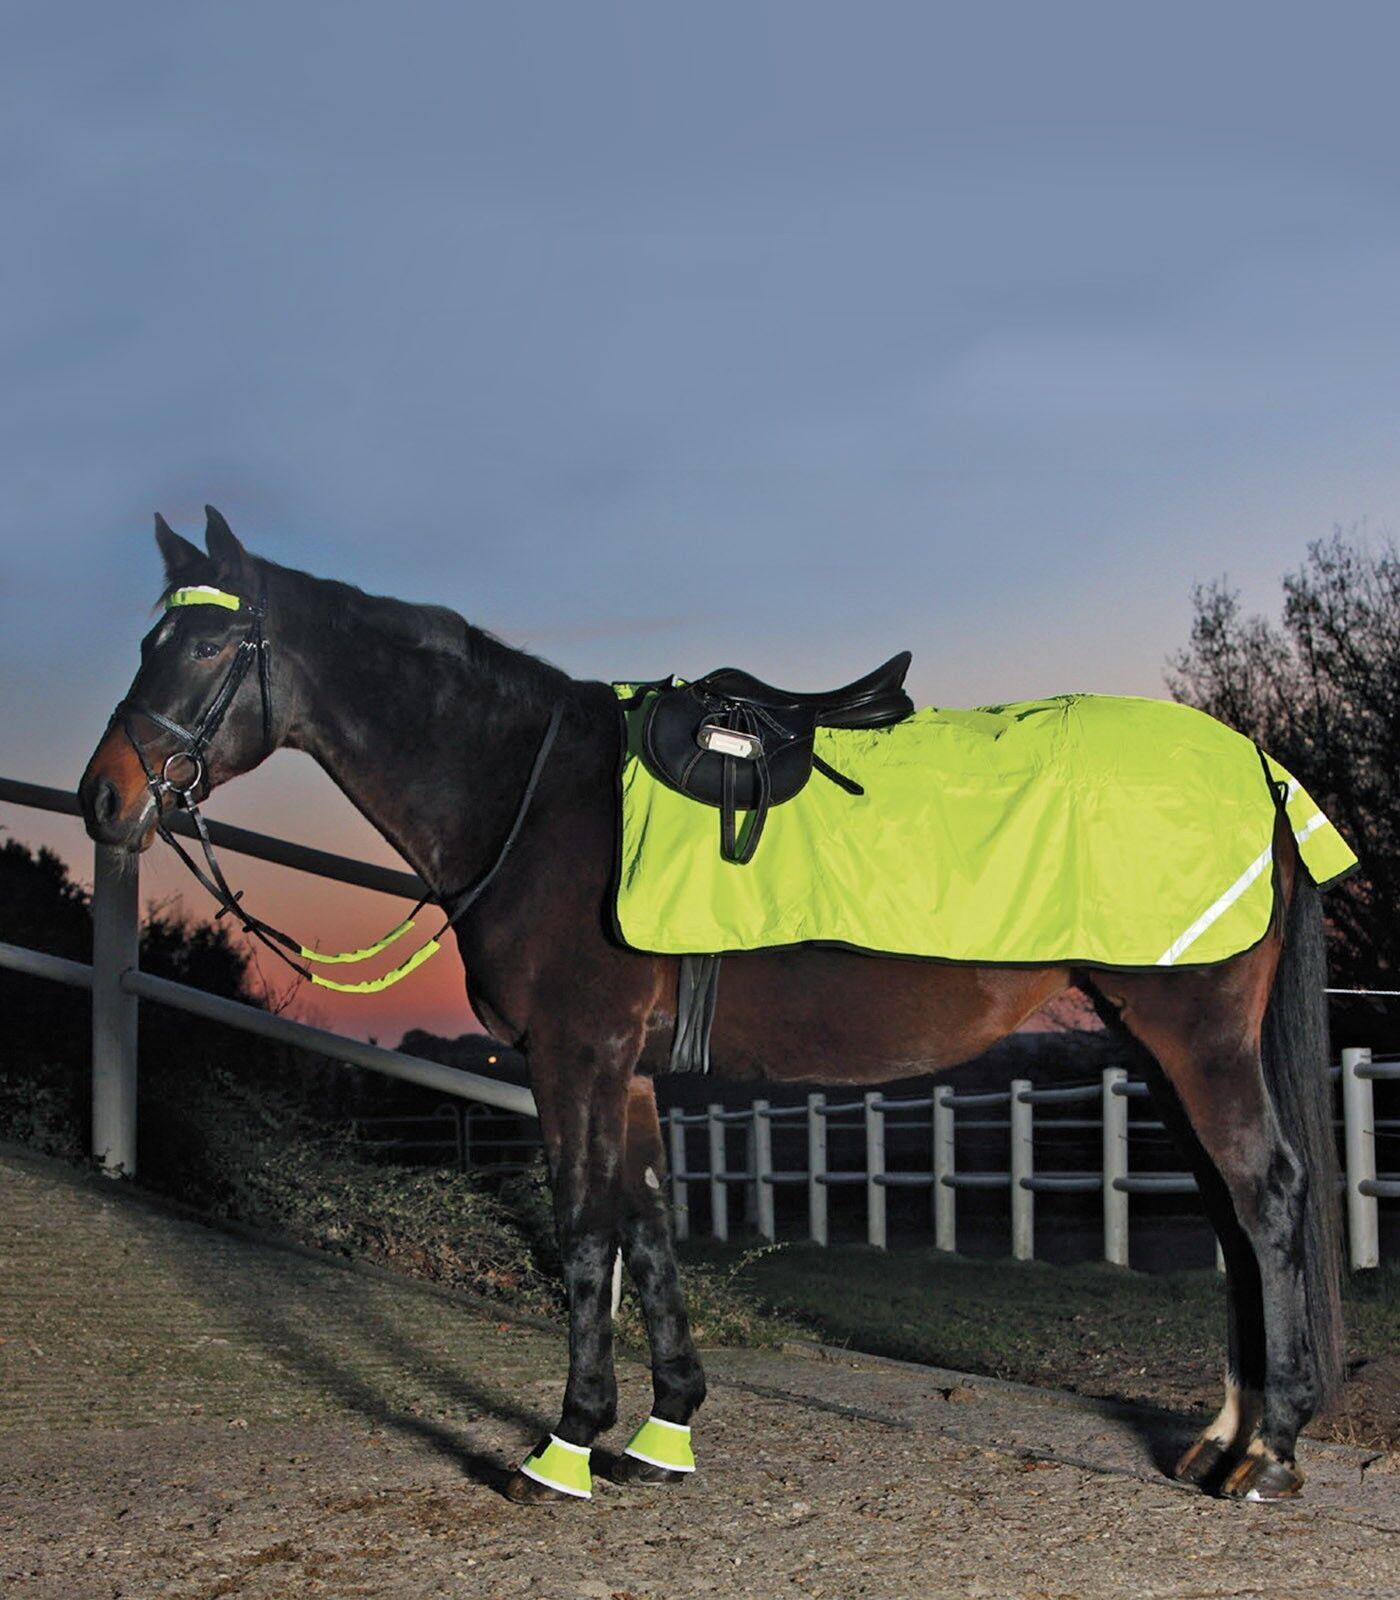 Reflex riñones manta ausreitdecke con fleecefutter fleecefutter fleecefutter  oferta de tienda